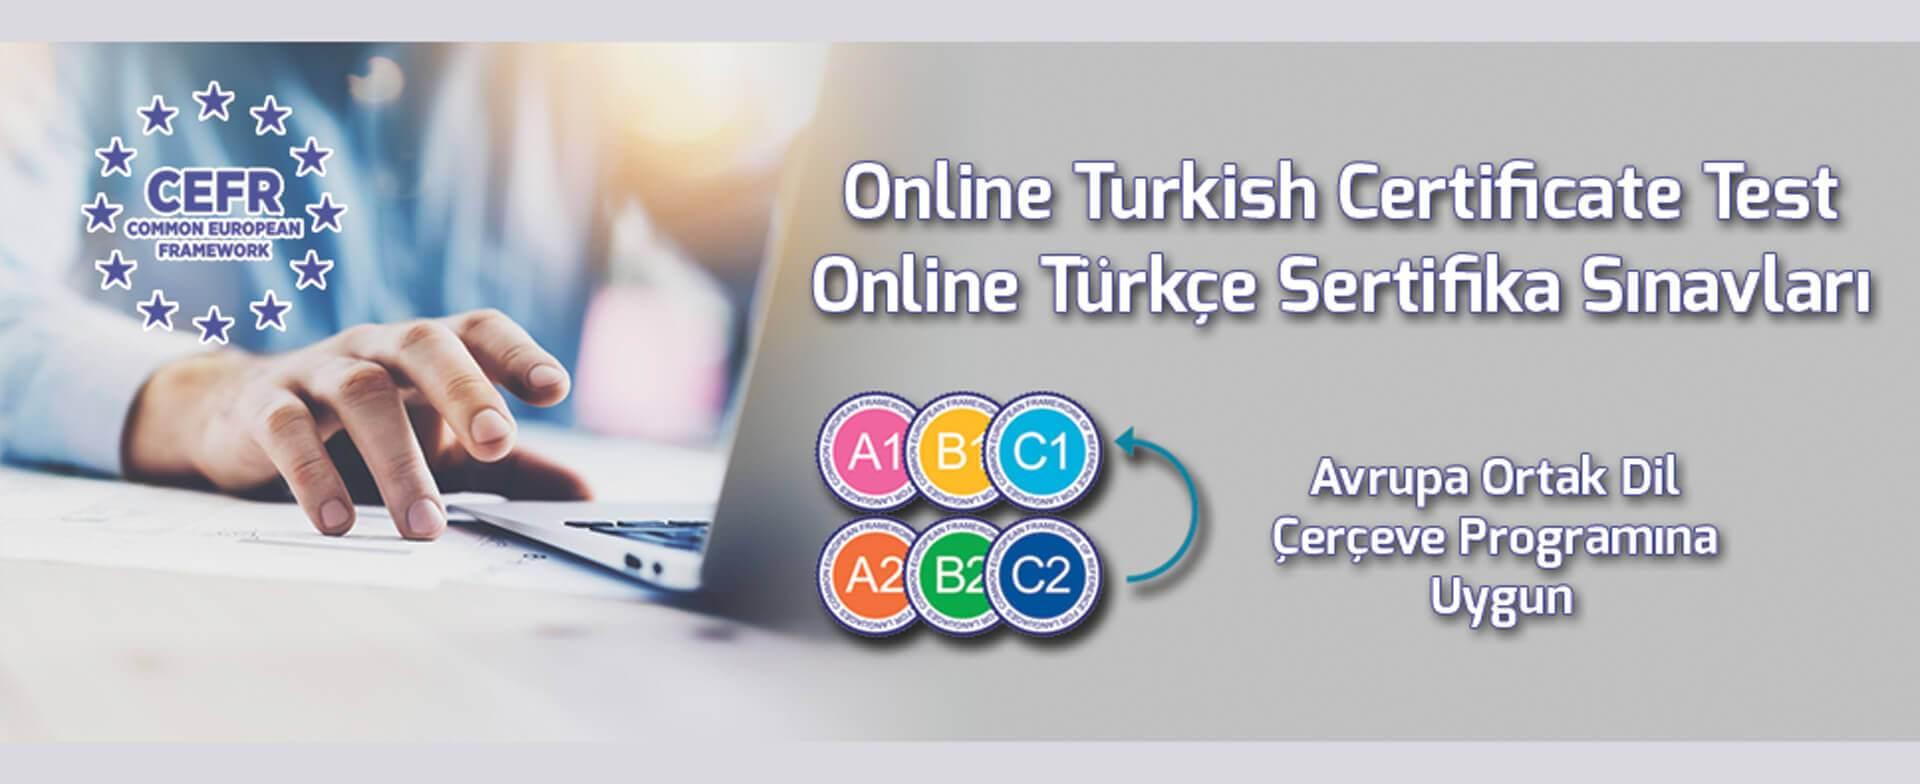 online-banner-web-min